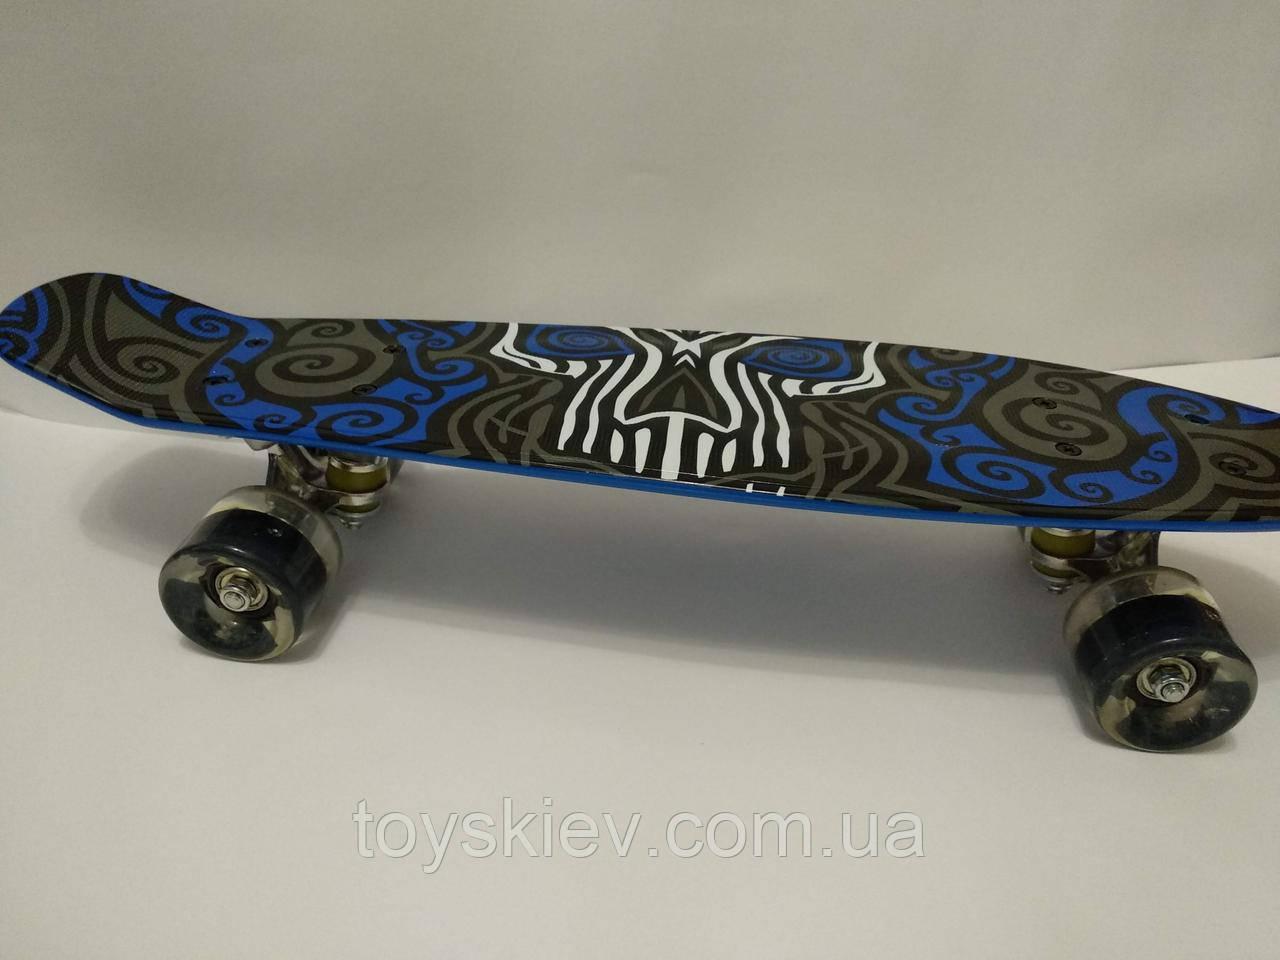 Скейт Пенни борд (Penny board) 820-16 с рисунком, светящийся